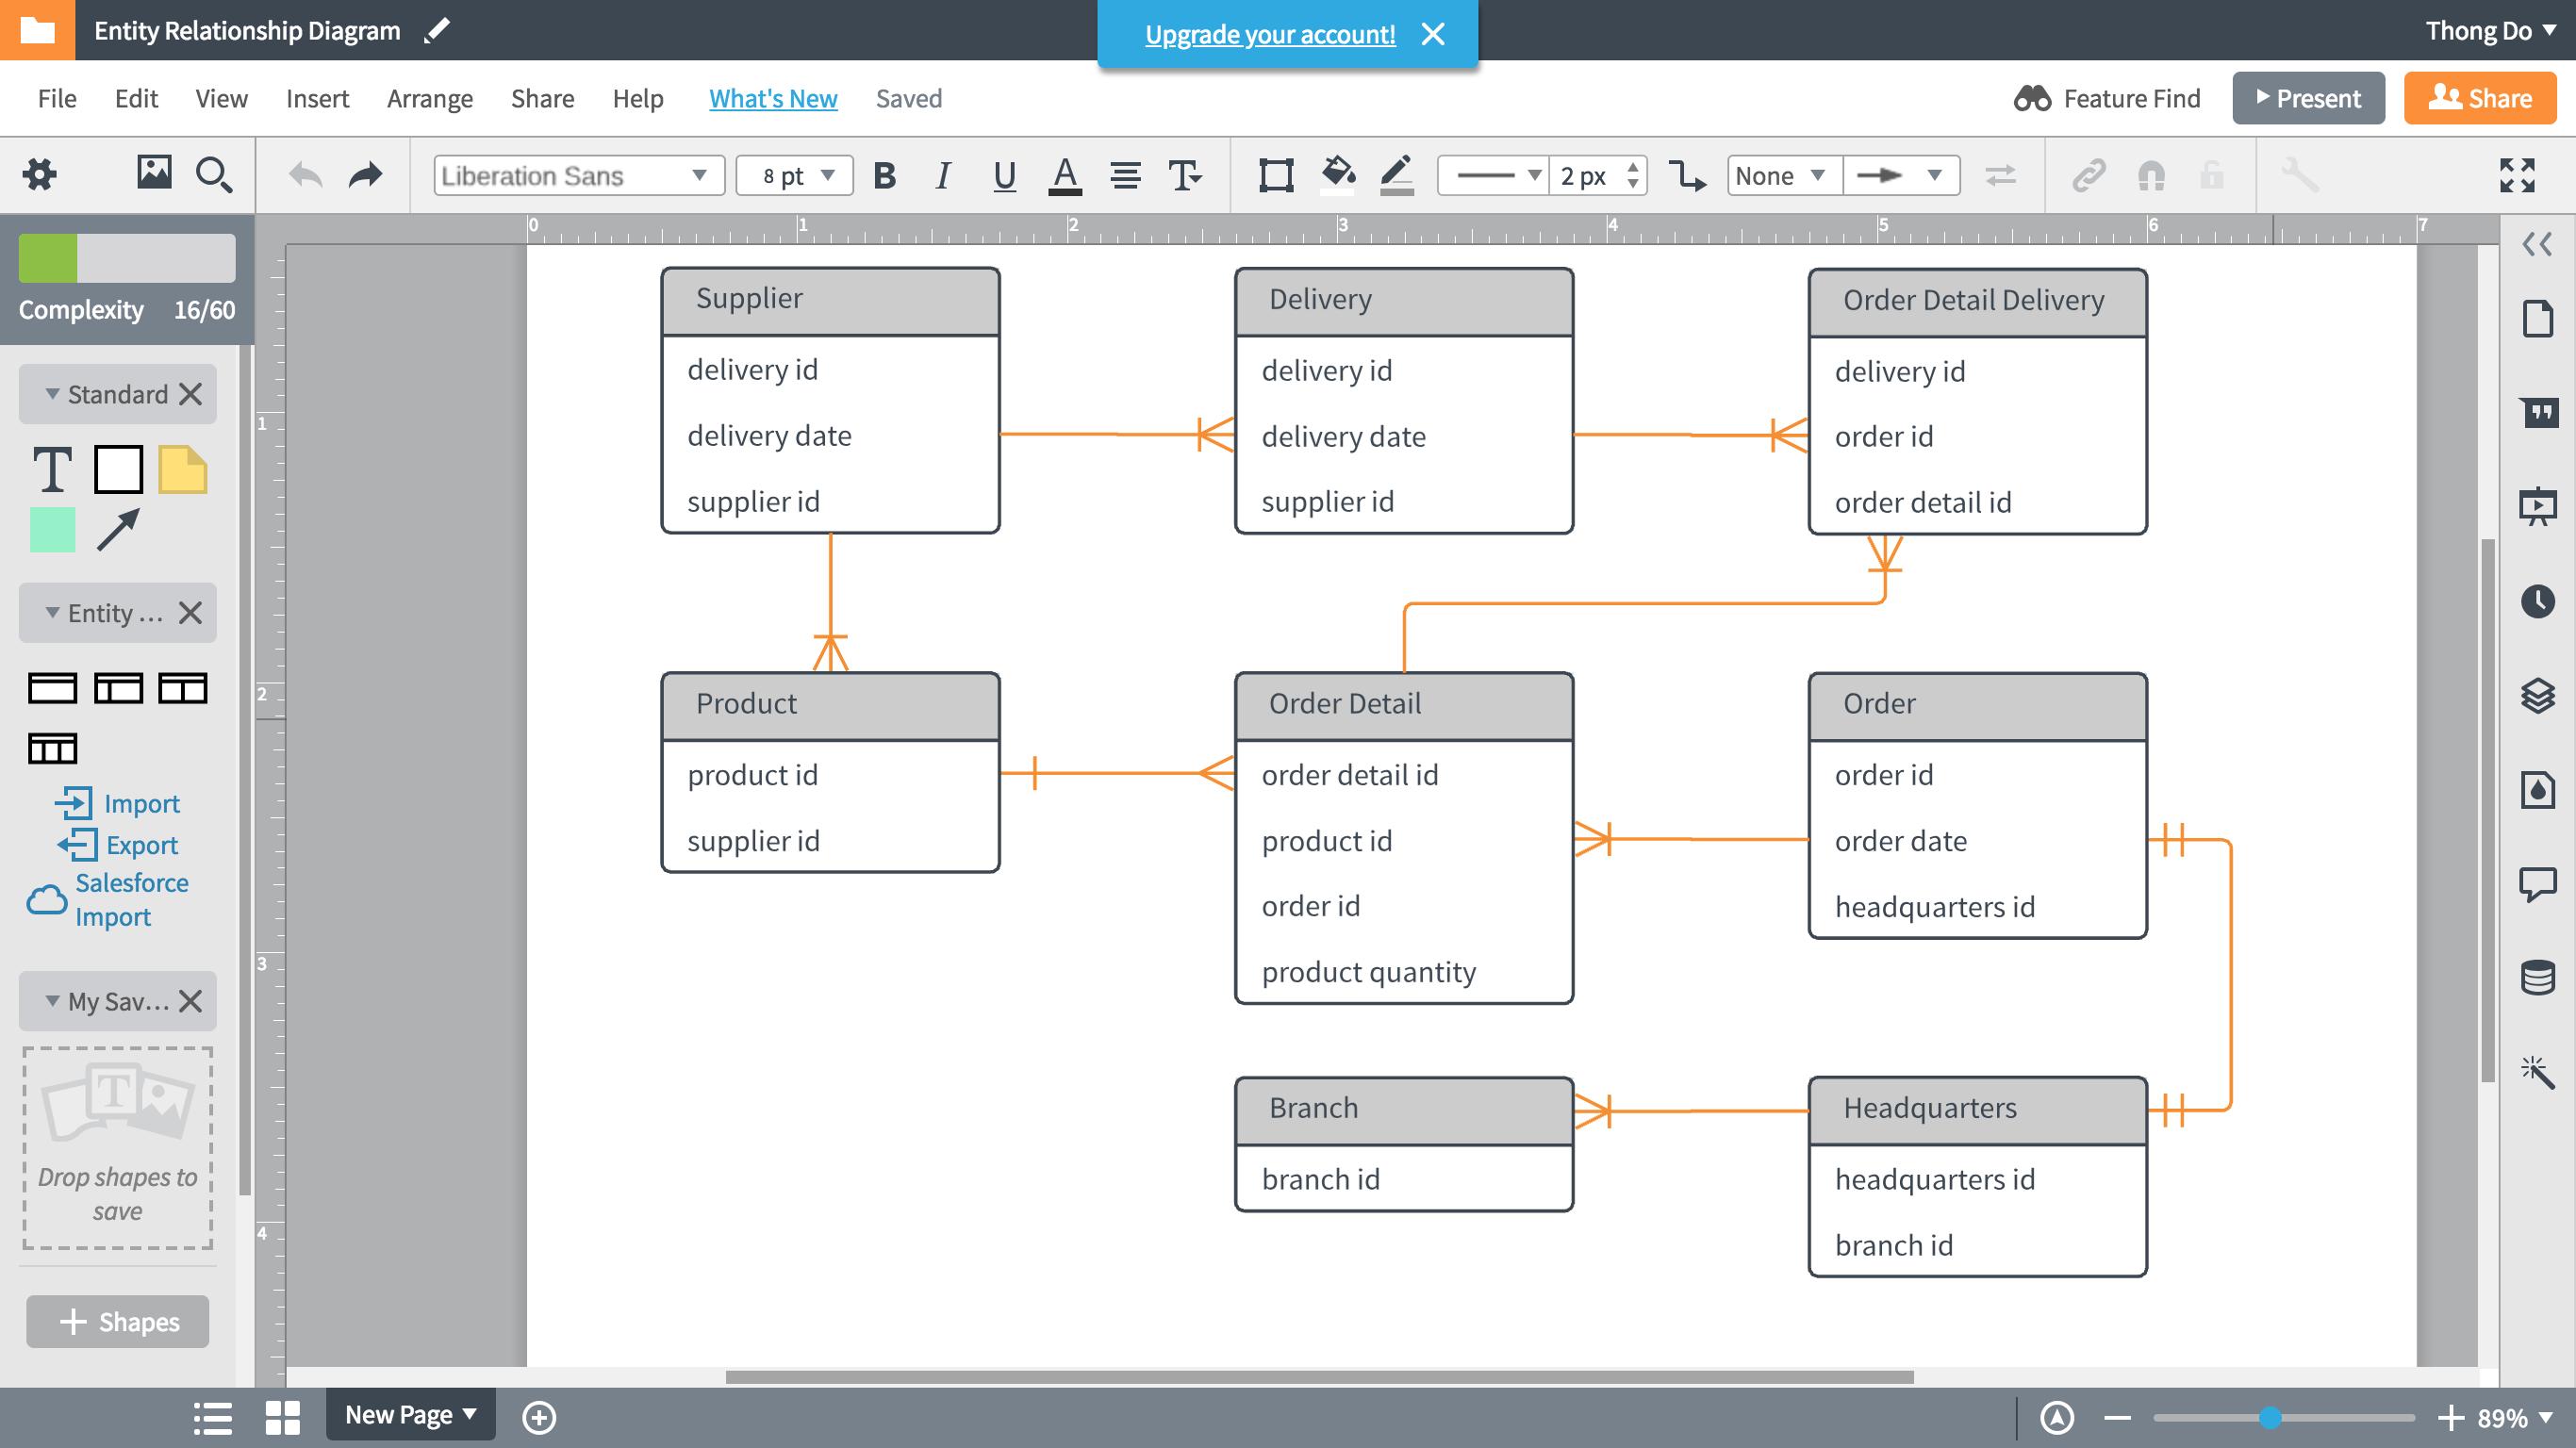 19 Simple Network Diagram Software Open Source Design Ideas Http Bookingritzcarlton Info 19 Simple Network Di Relationship Diagram Diagram Data Flow Diagram